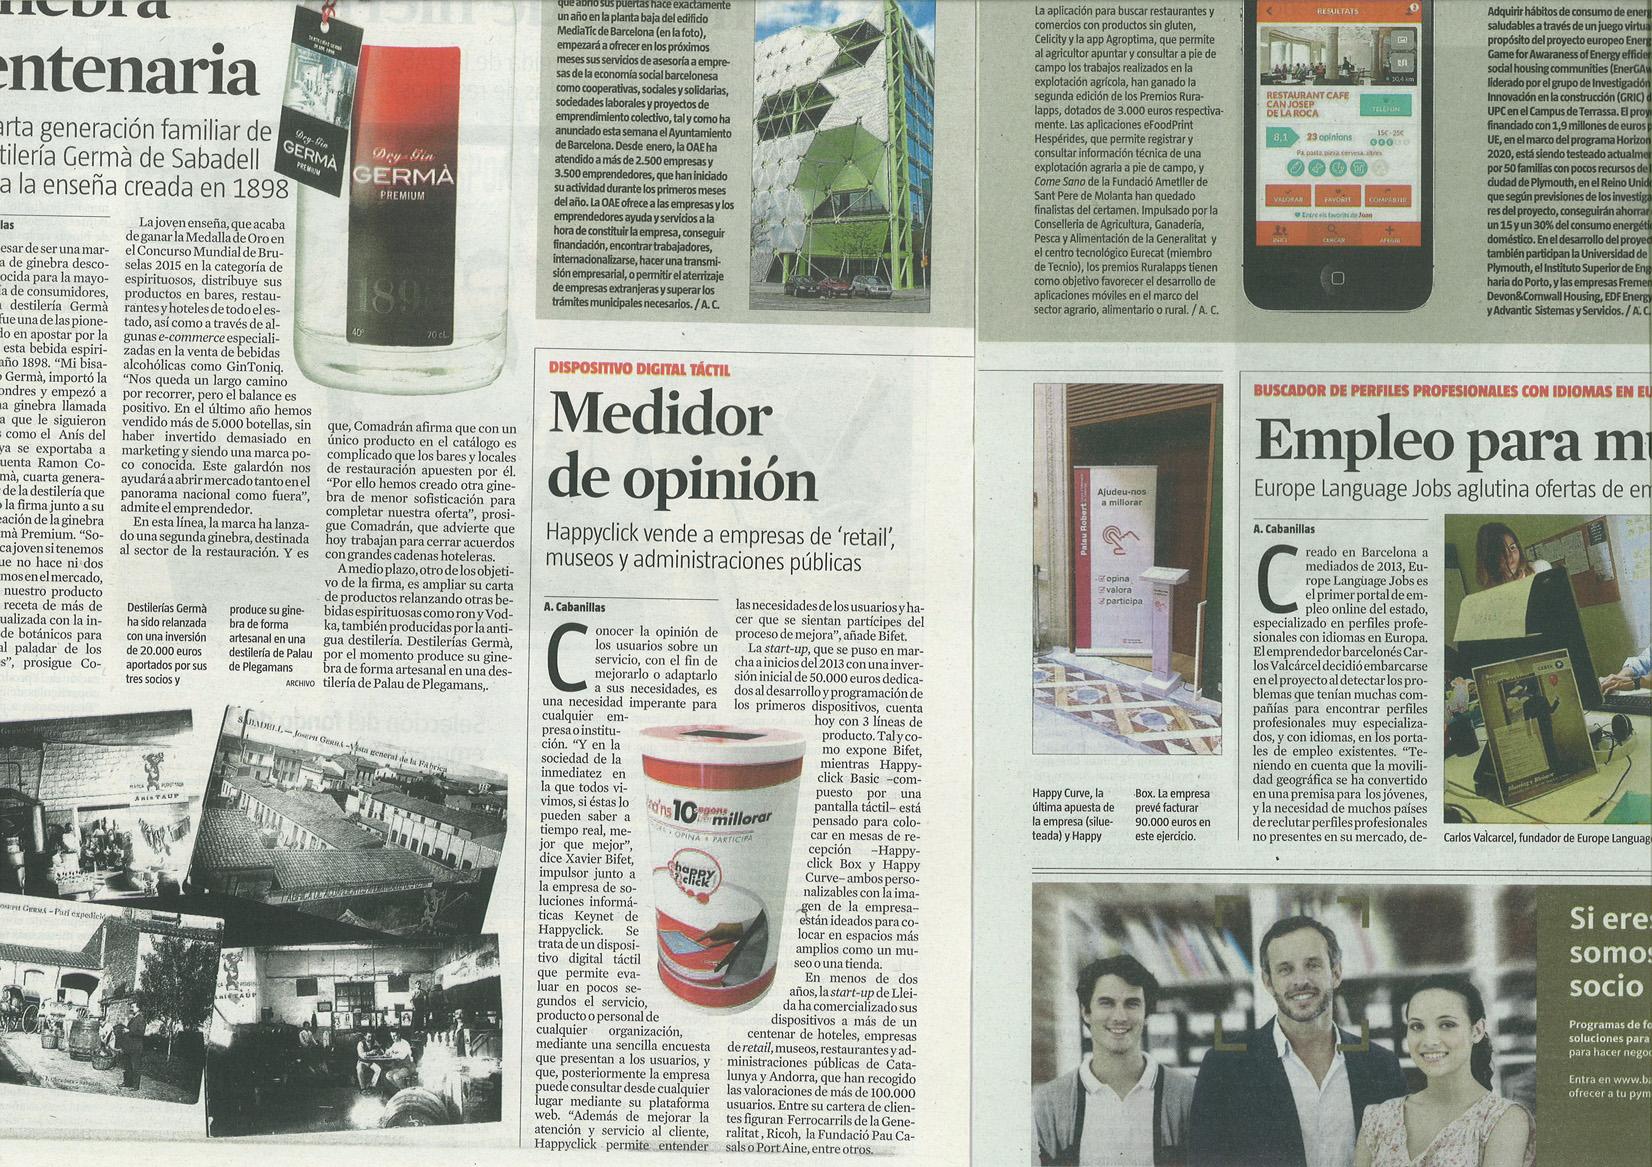 Happyclick en La Vanguardia